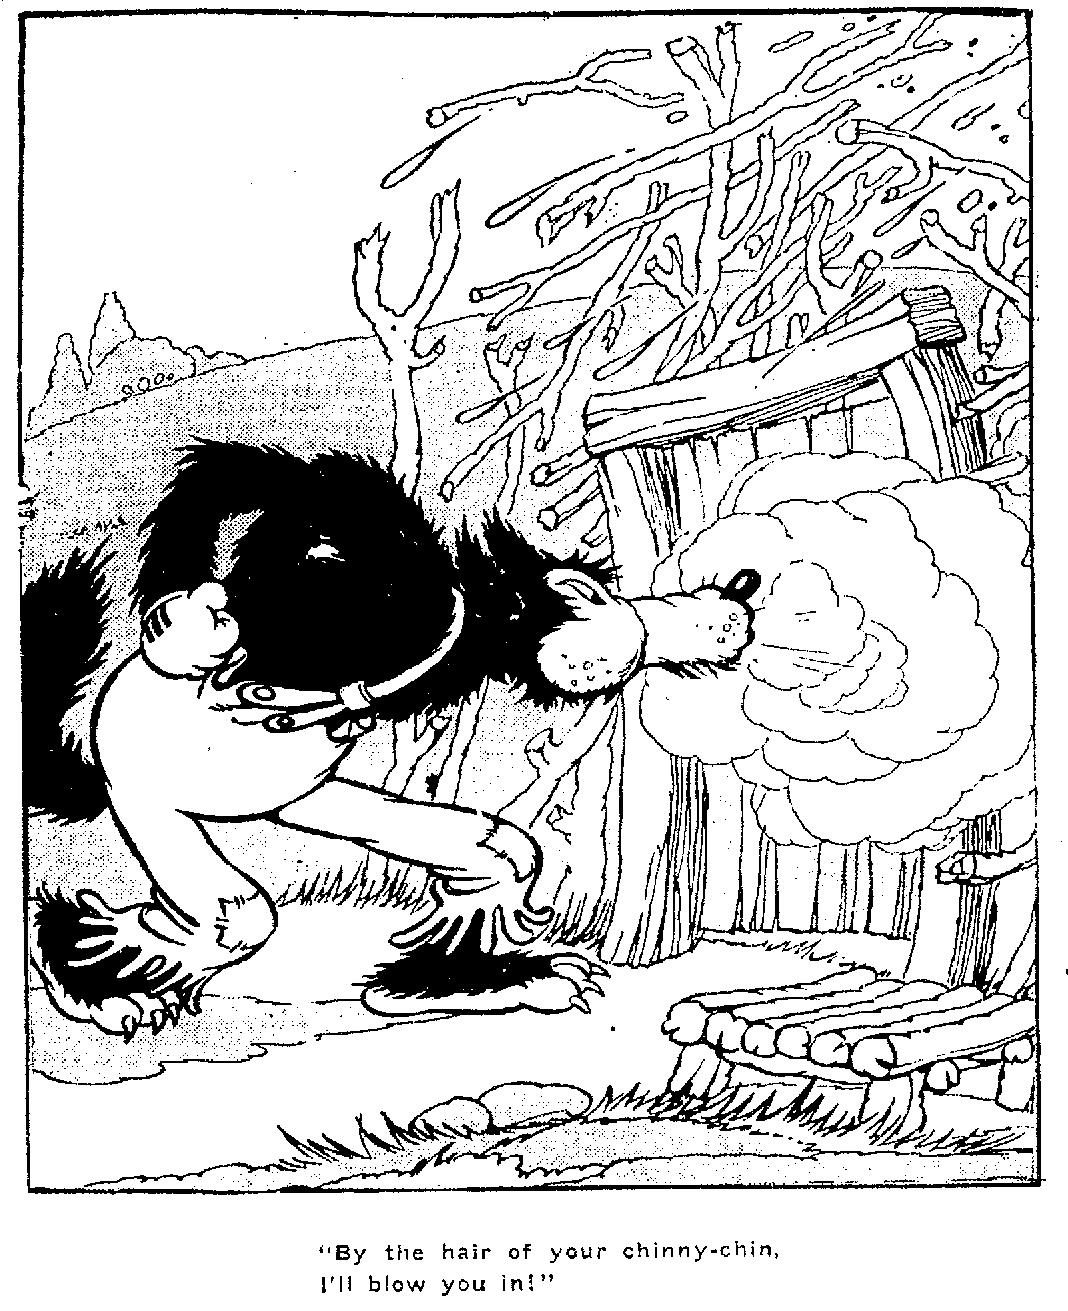 Tralfaz: Disney and his Big Bad Wolf